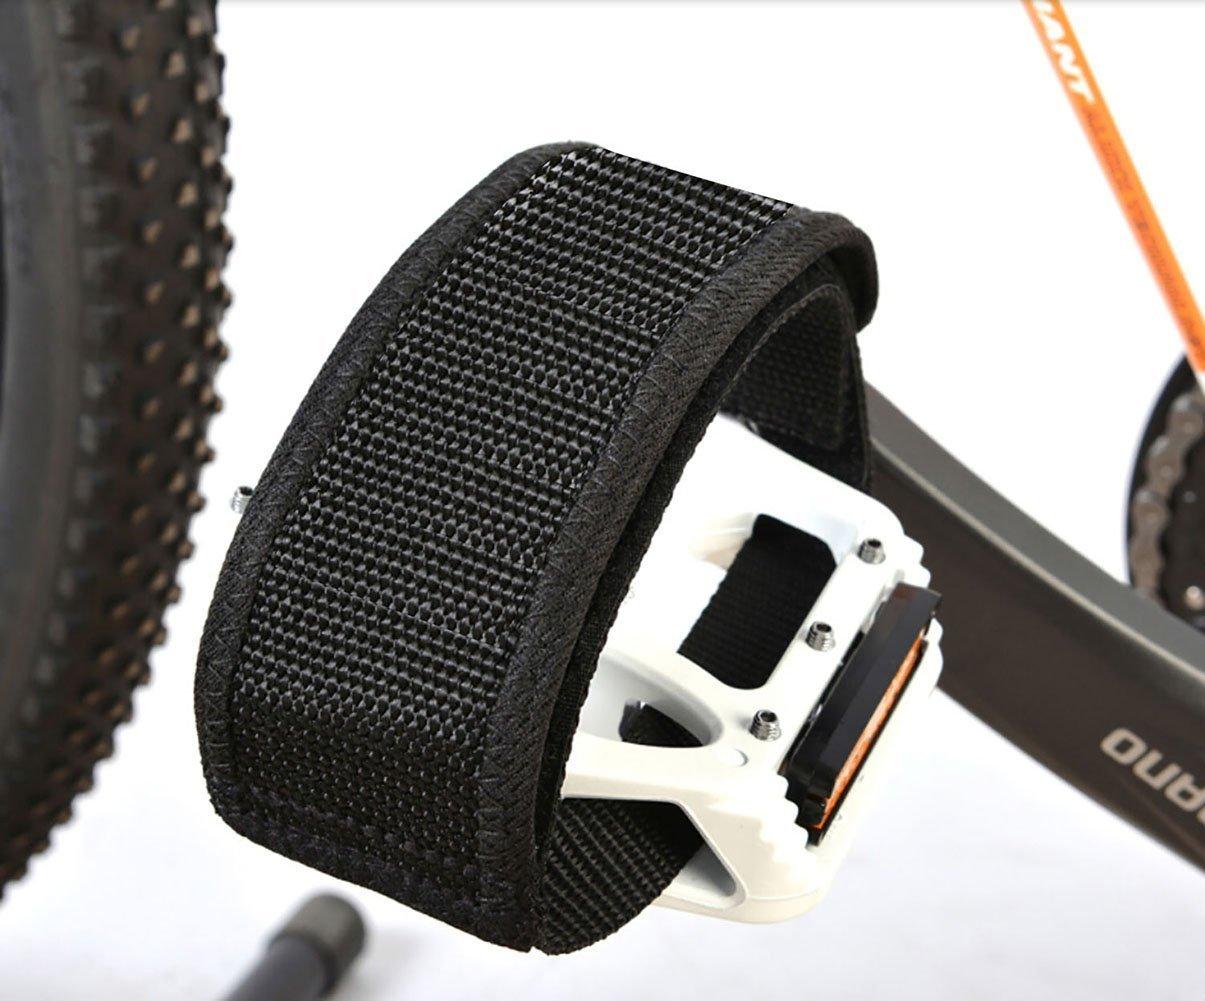 wommty correas de 1/par de pedal de bicicleta pedal Toe Clips Straps cinta para fijo Gear Bike Negro